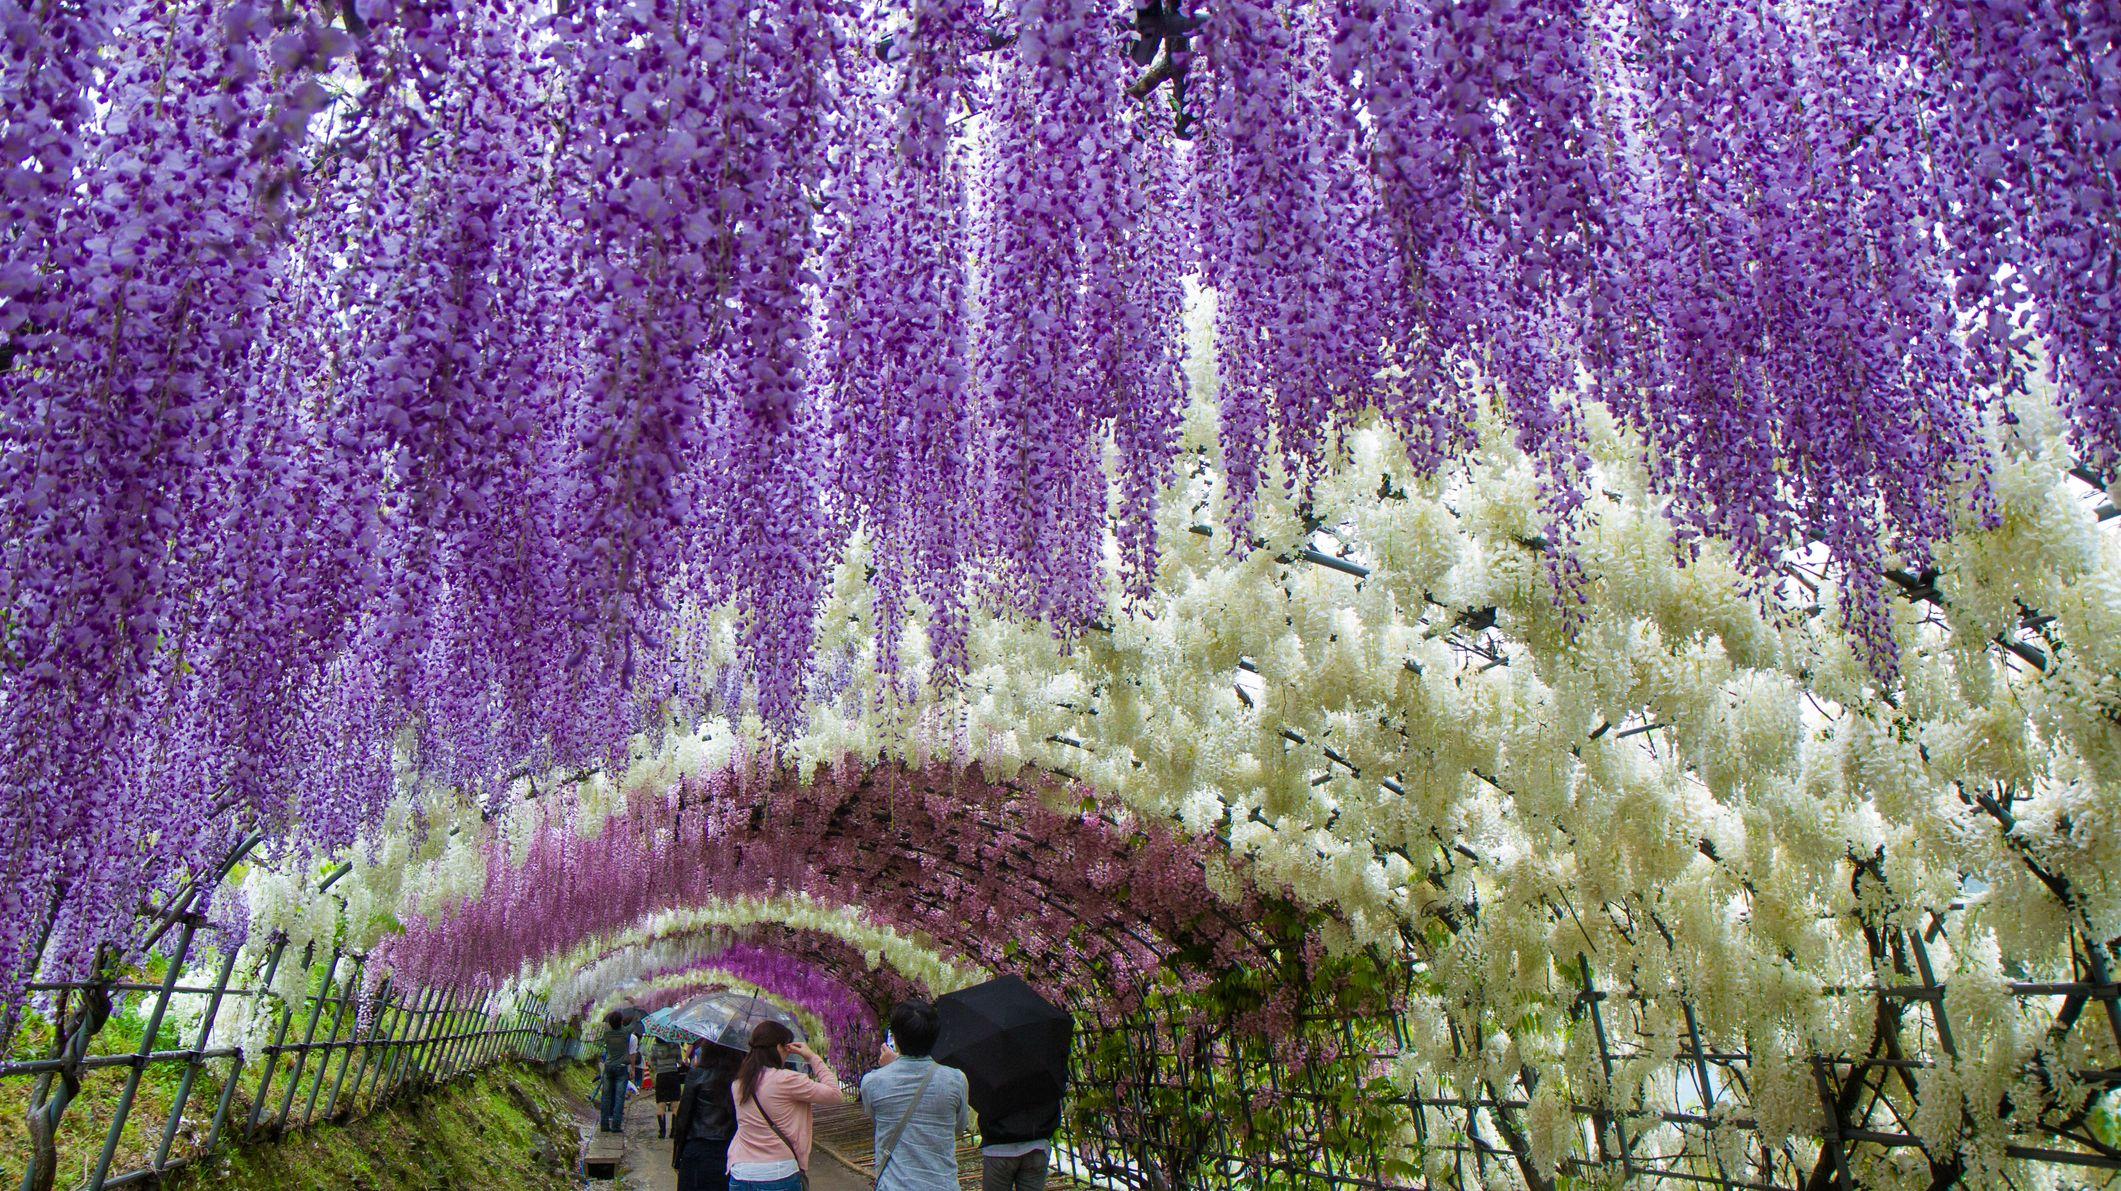 The Kawachi Wisteria Garden in Fukuoka, Japan